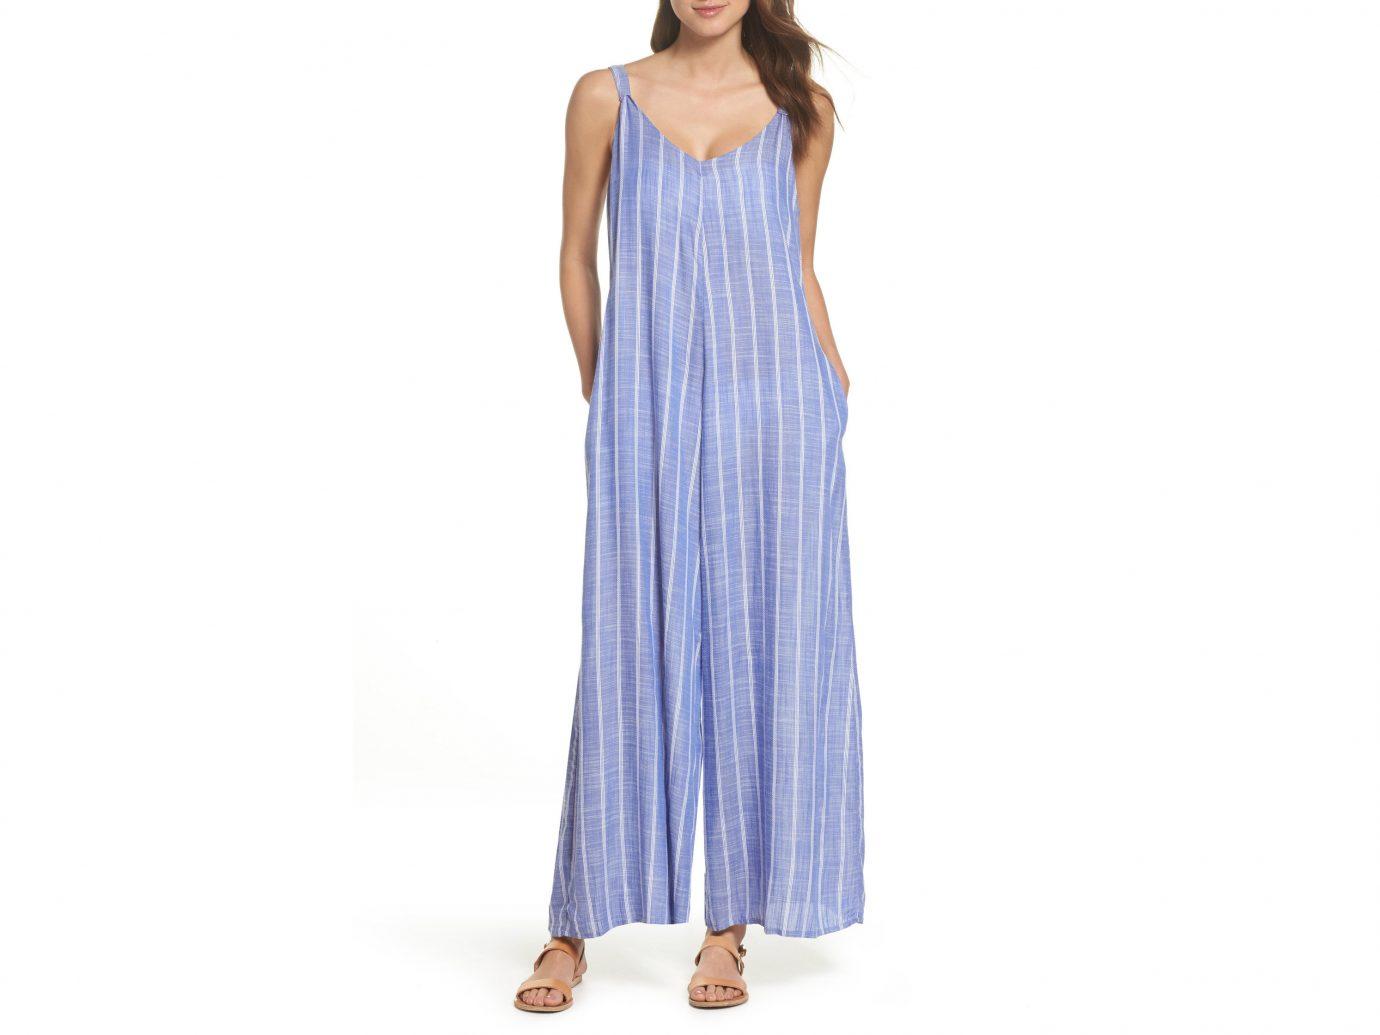 Style + Design Travel Shop clothing day dress dress shoulder one piece garment neck gown electric blue formal wear skirt